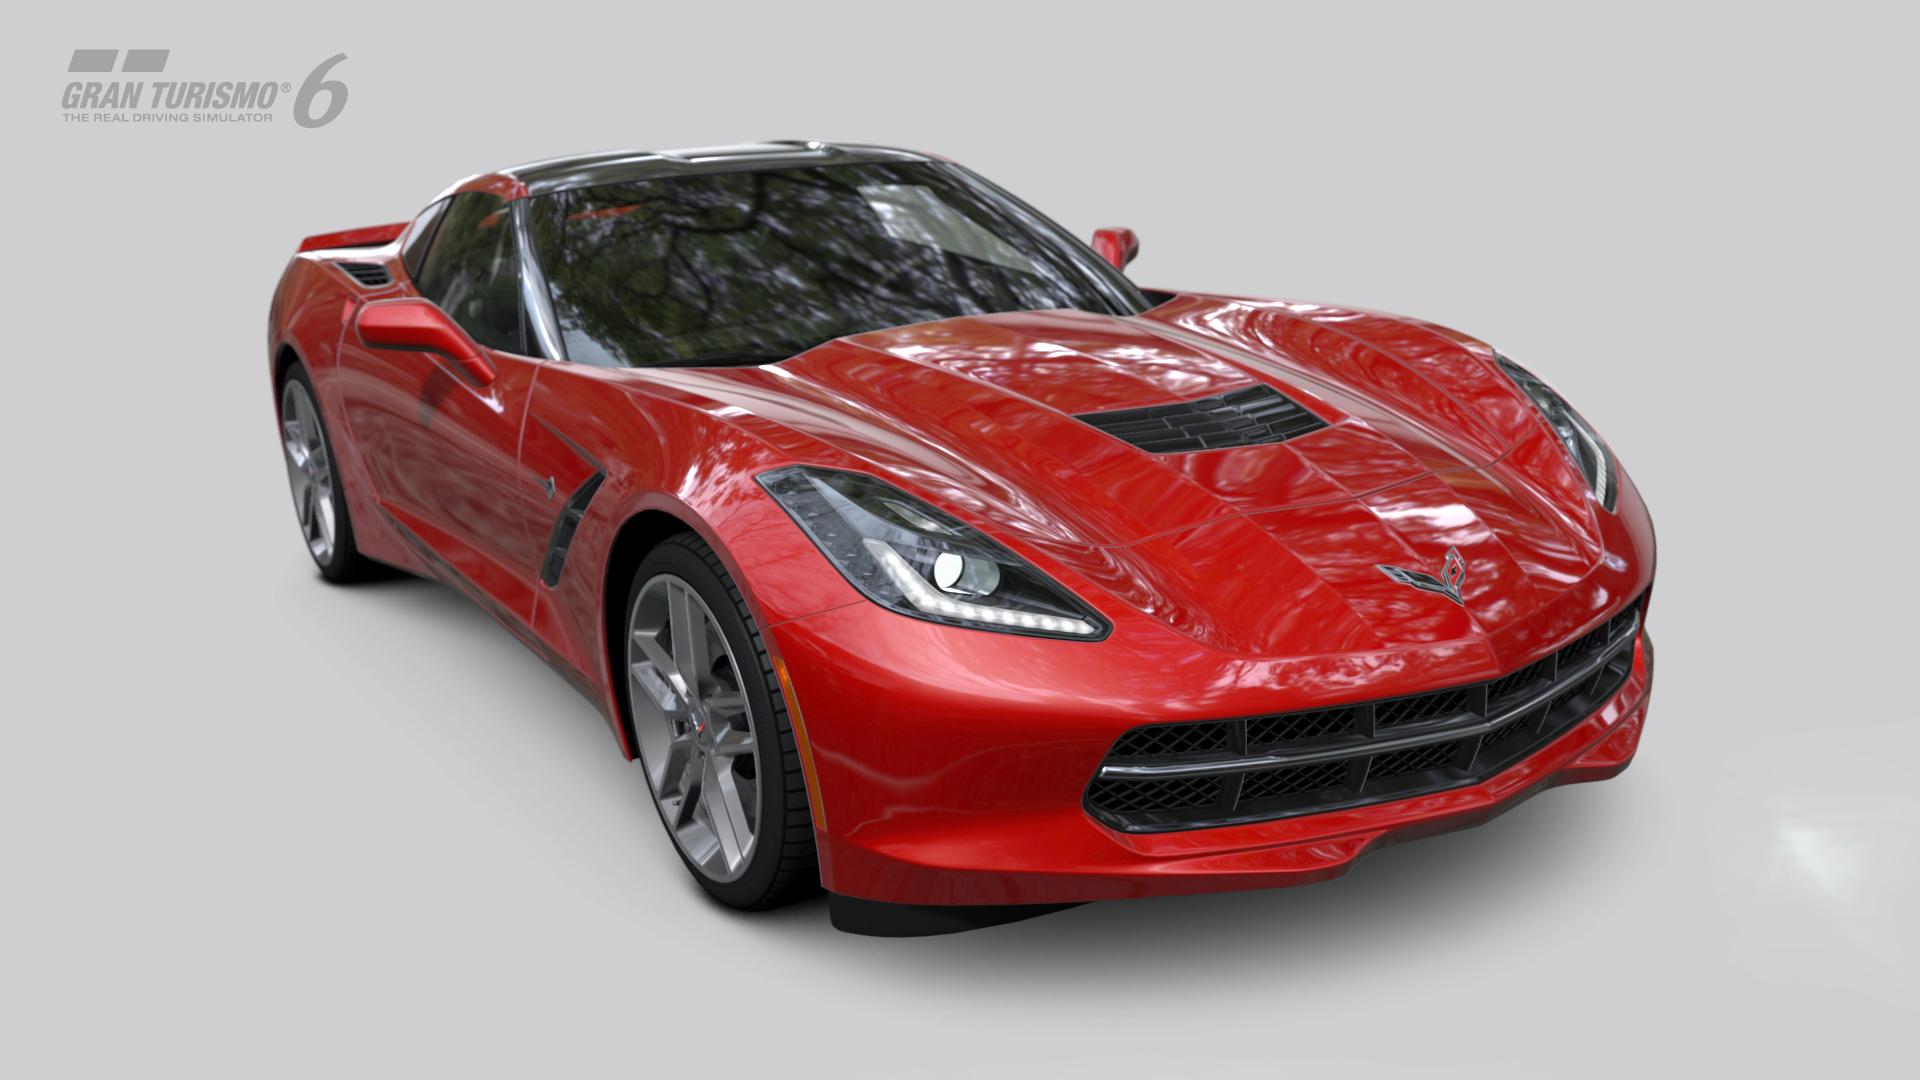 Gran Turismo 6: A fantasztikus Corvette Stingray C7